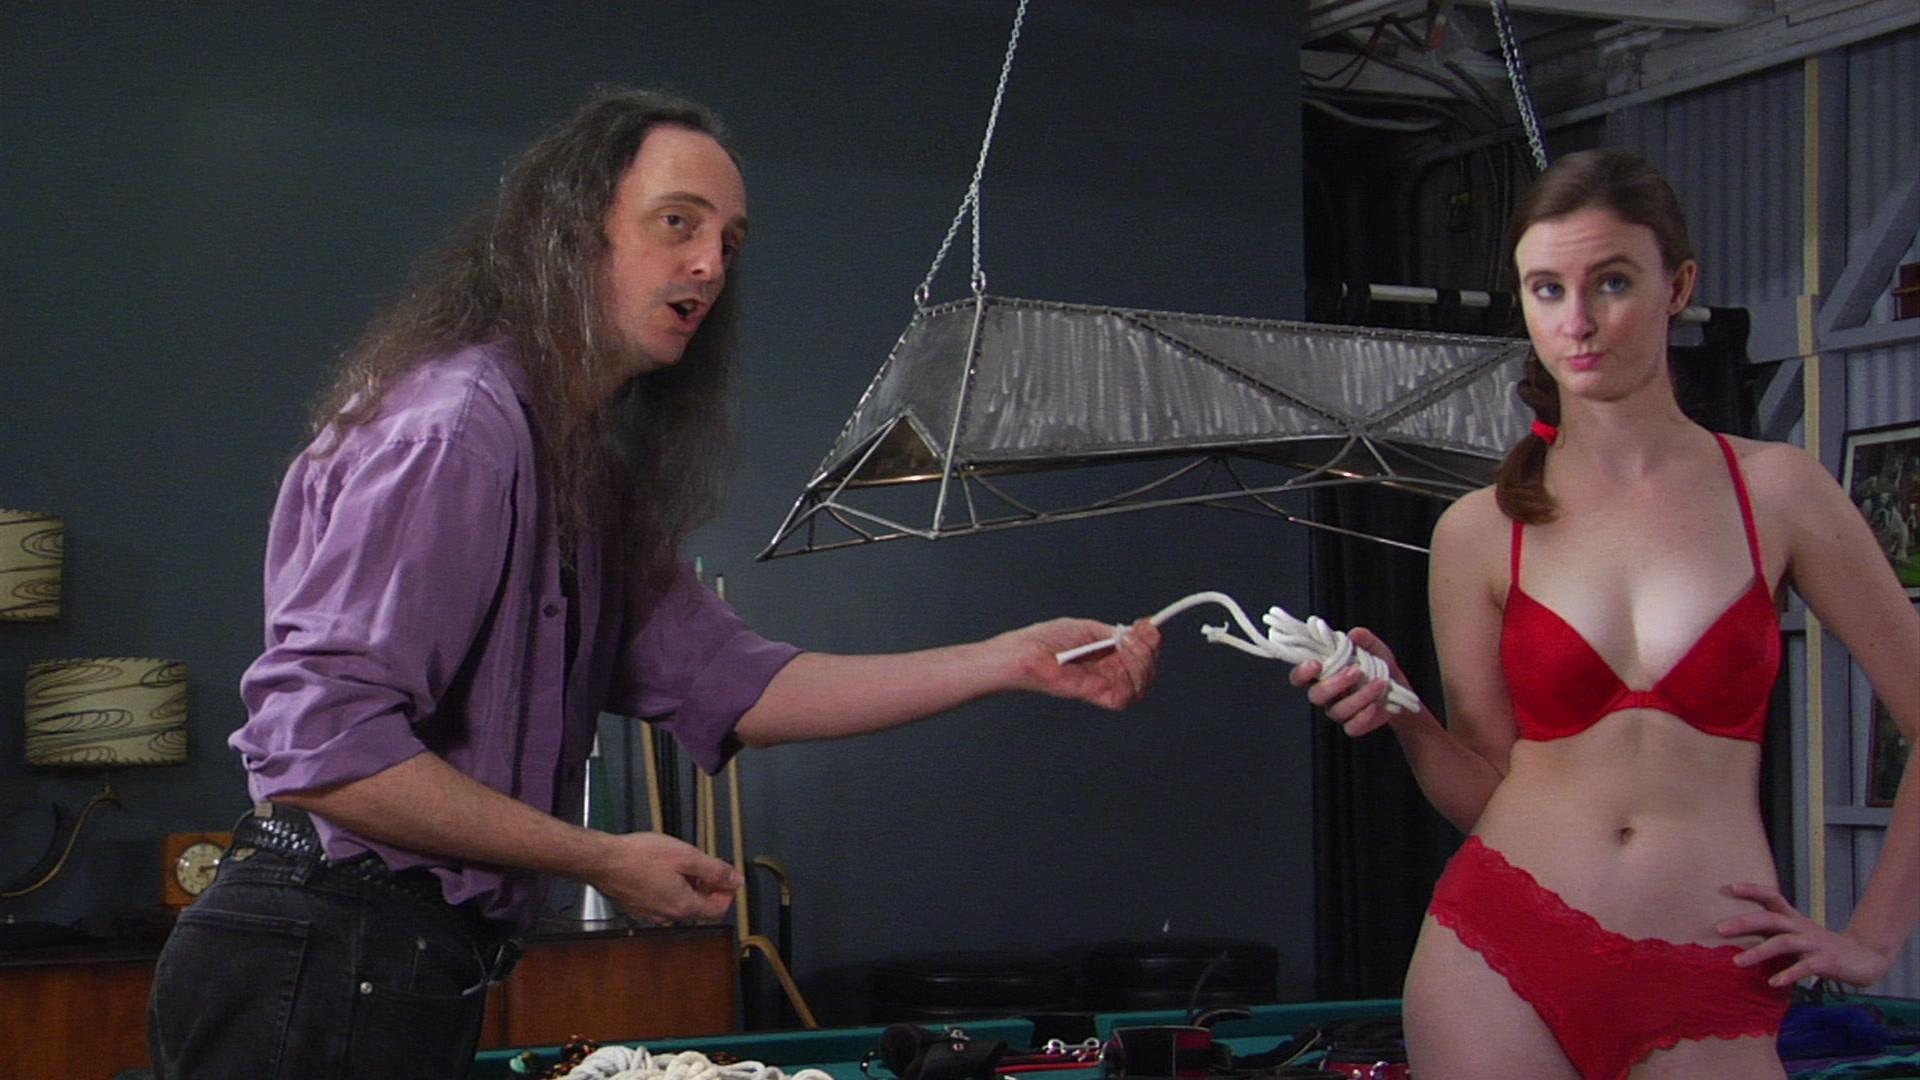 Orgy movie clips